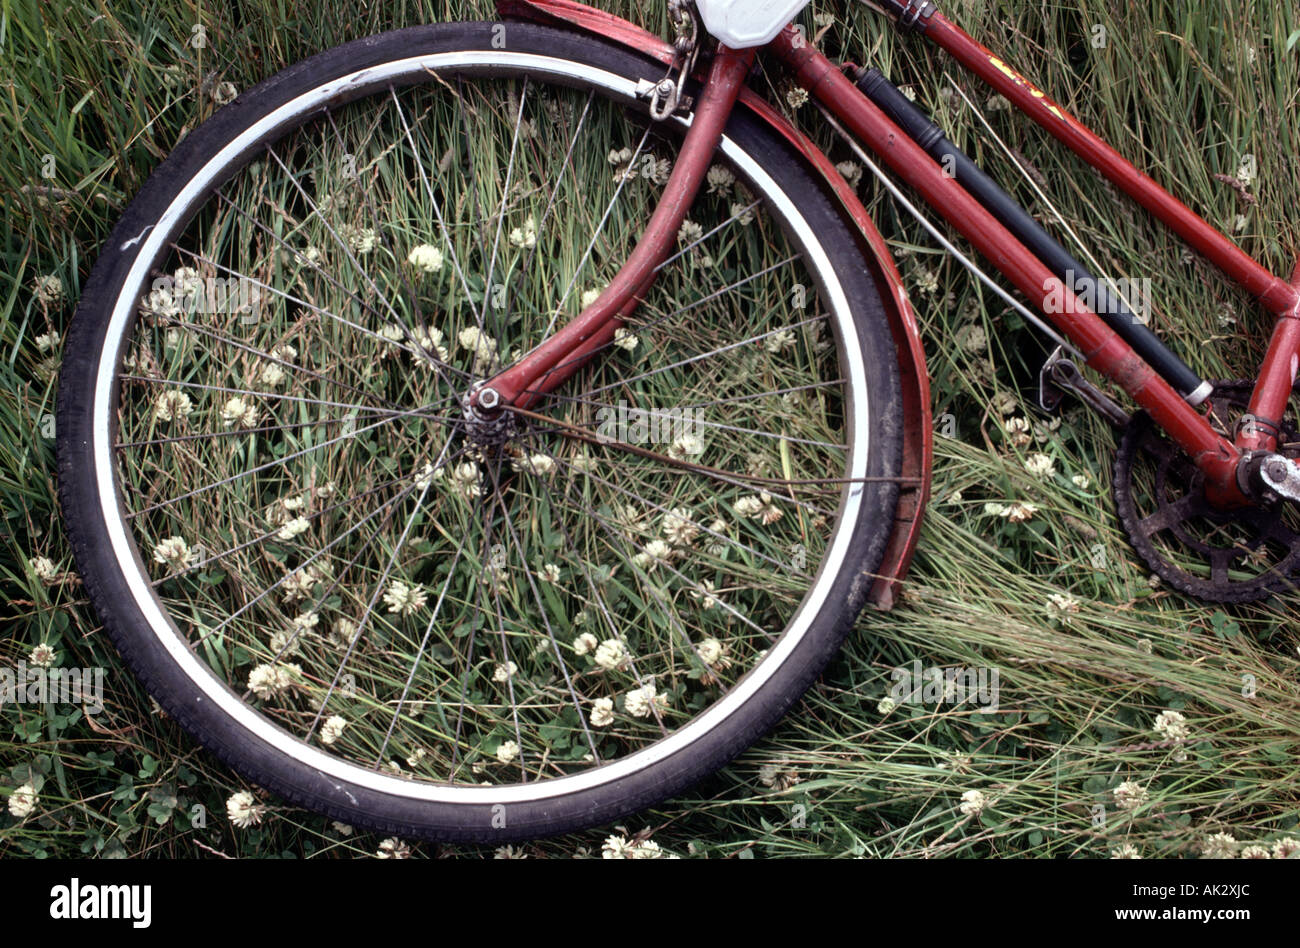 Still Life of red bike se reposant dans un champ Photo Stock